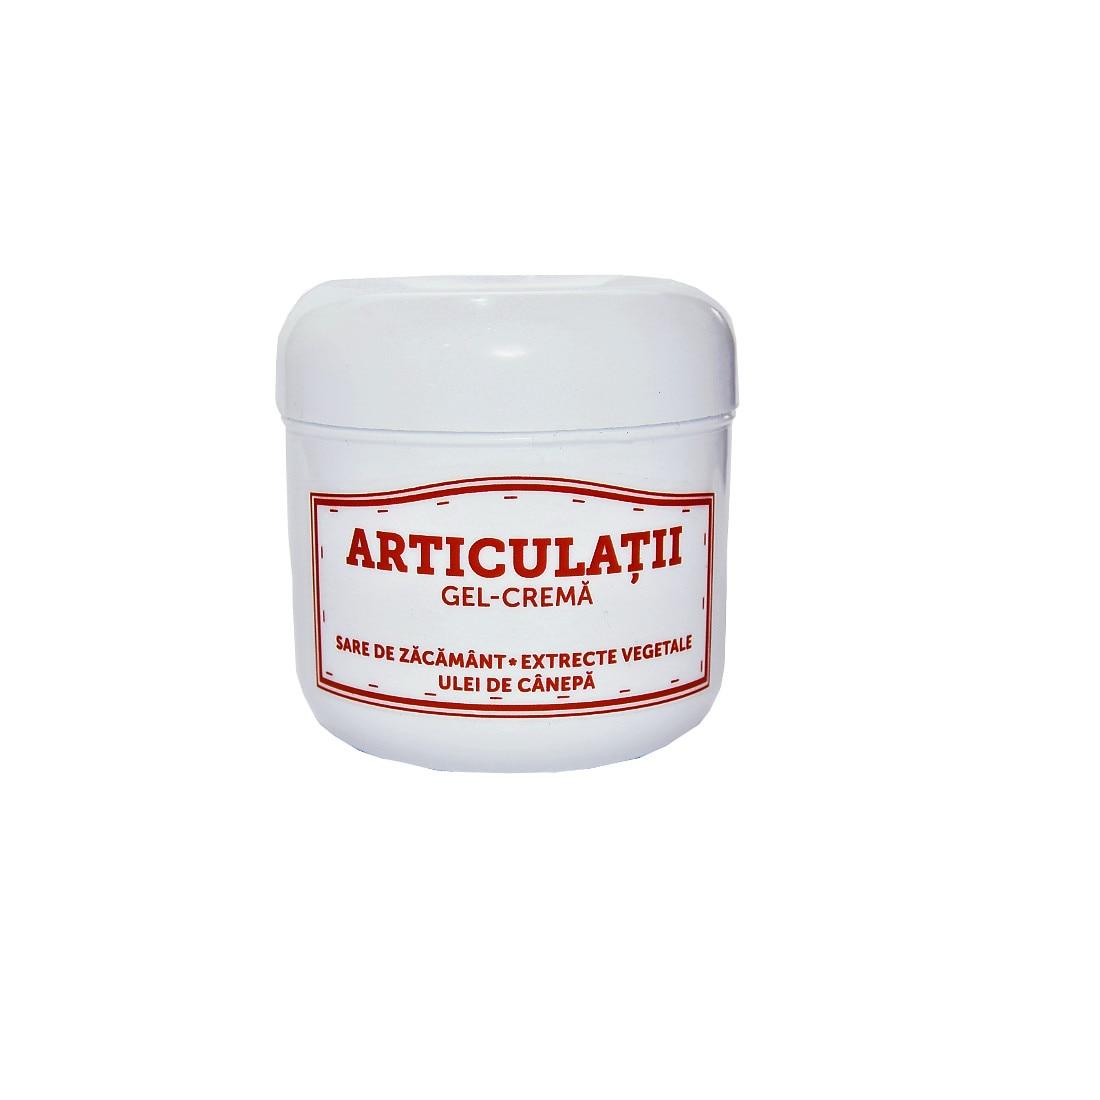 Artrovex – Pret Unguent Antiinflamator Puternic, Pareri Forum si Farmacie (2020)